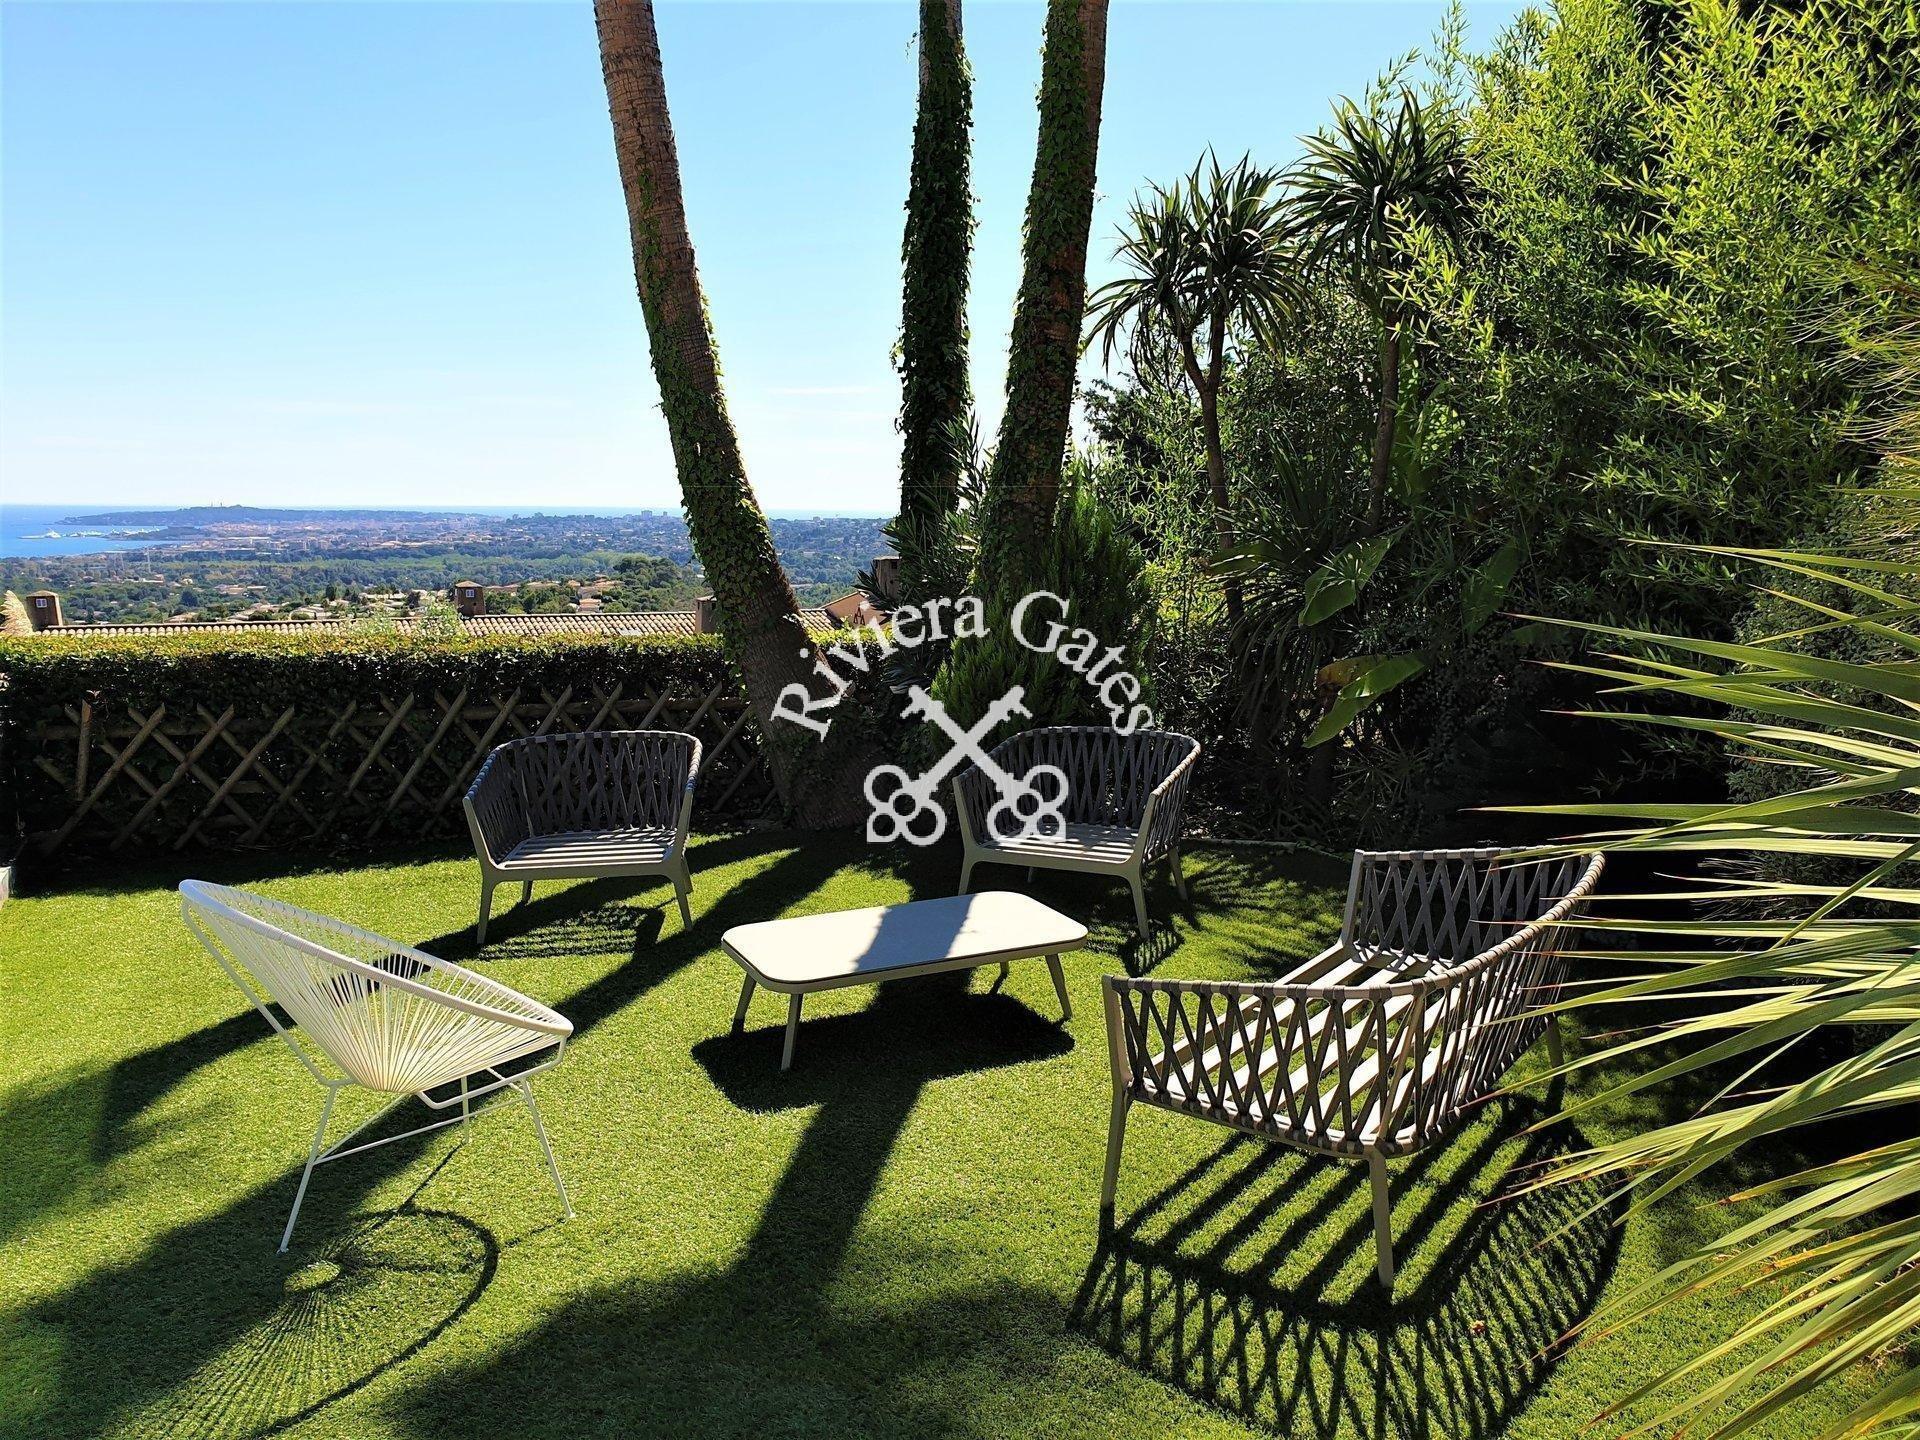 For rent - Luxurious 3 bedroom villa with pool & see view - Les Hauts de Vaugrenier